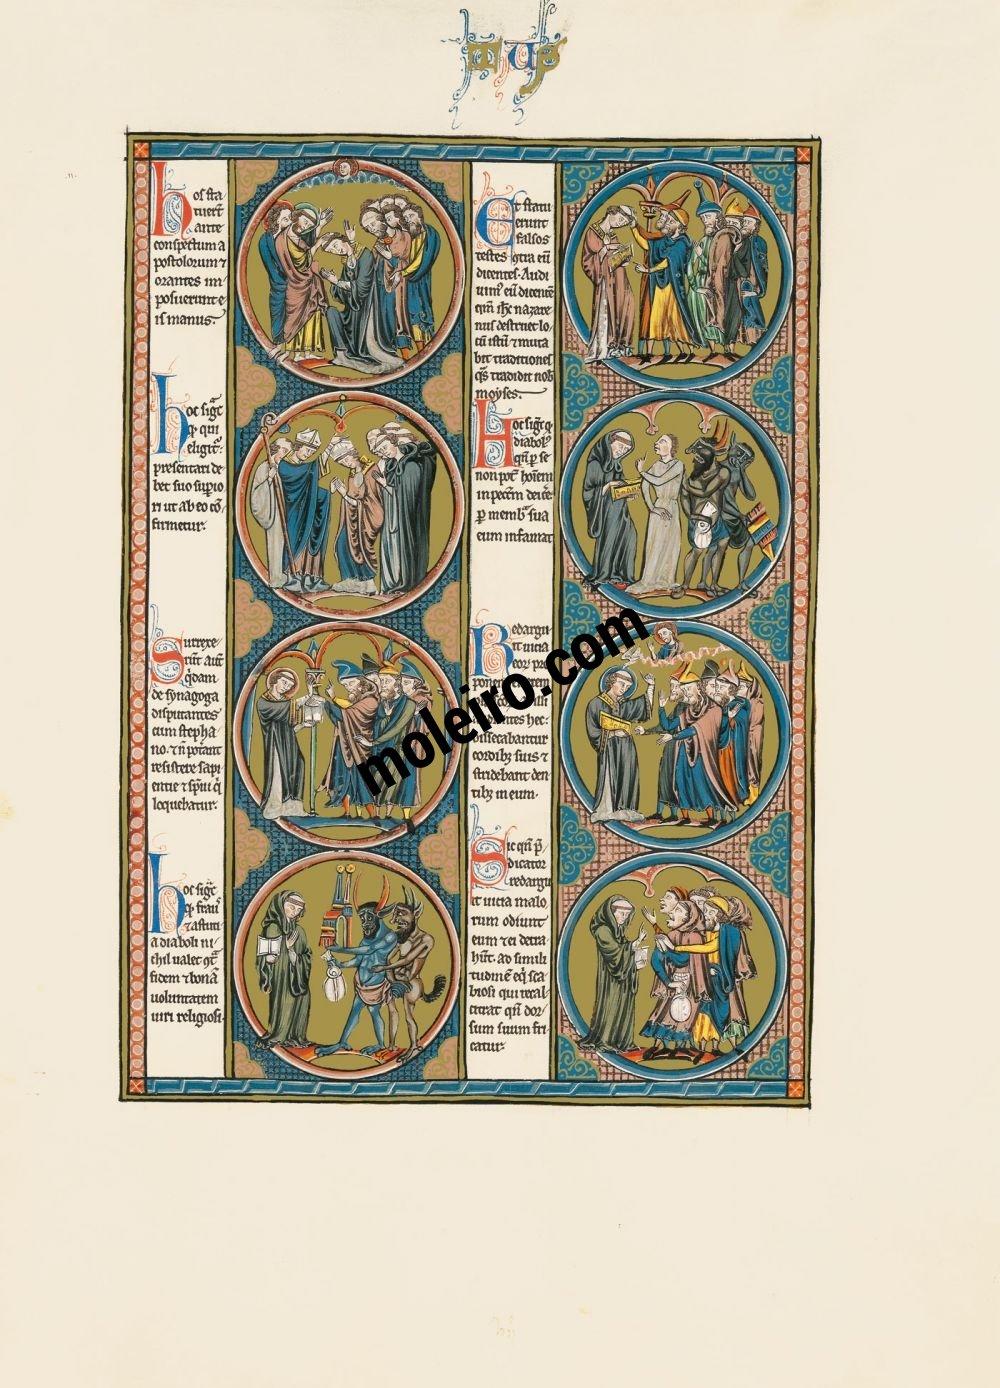 La Bible de Saint Louis vol.3, f. 90r